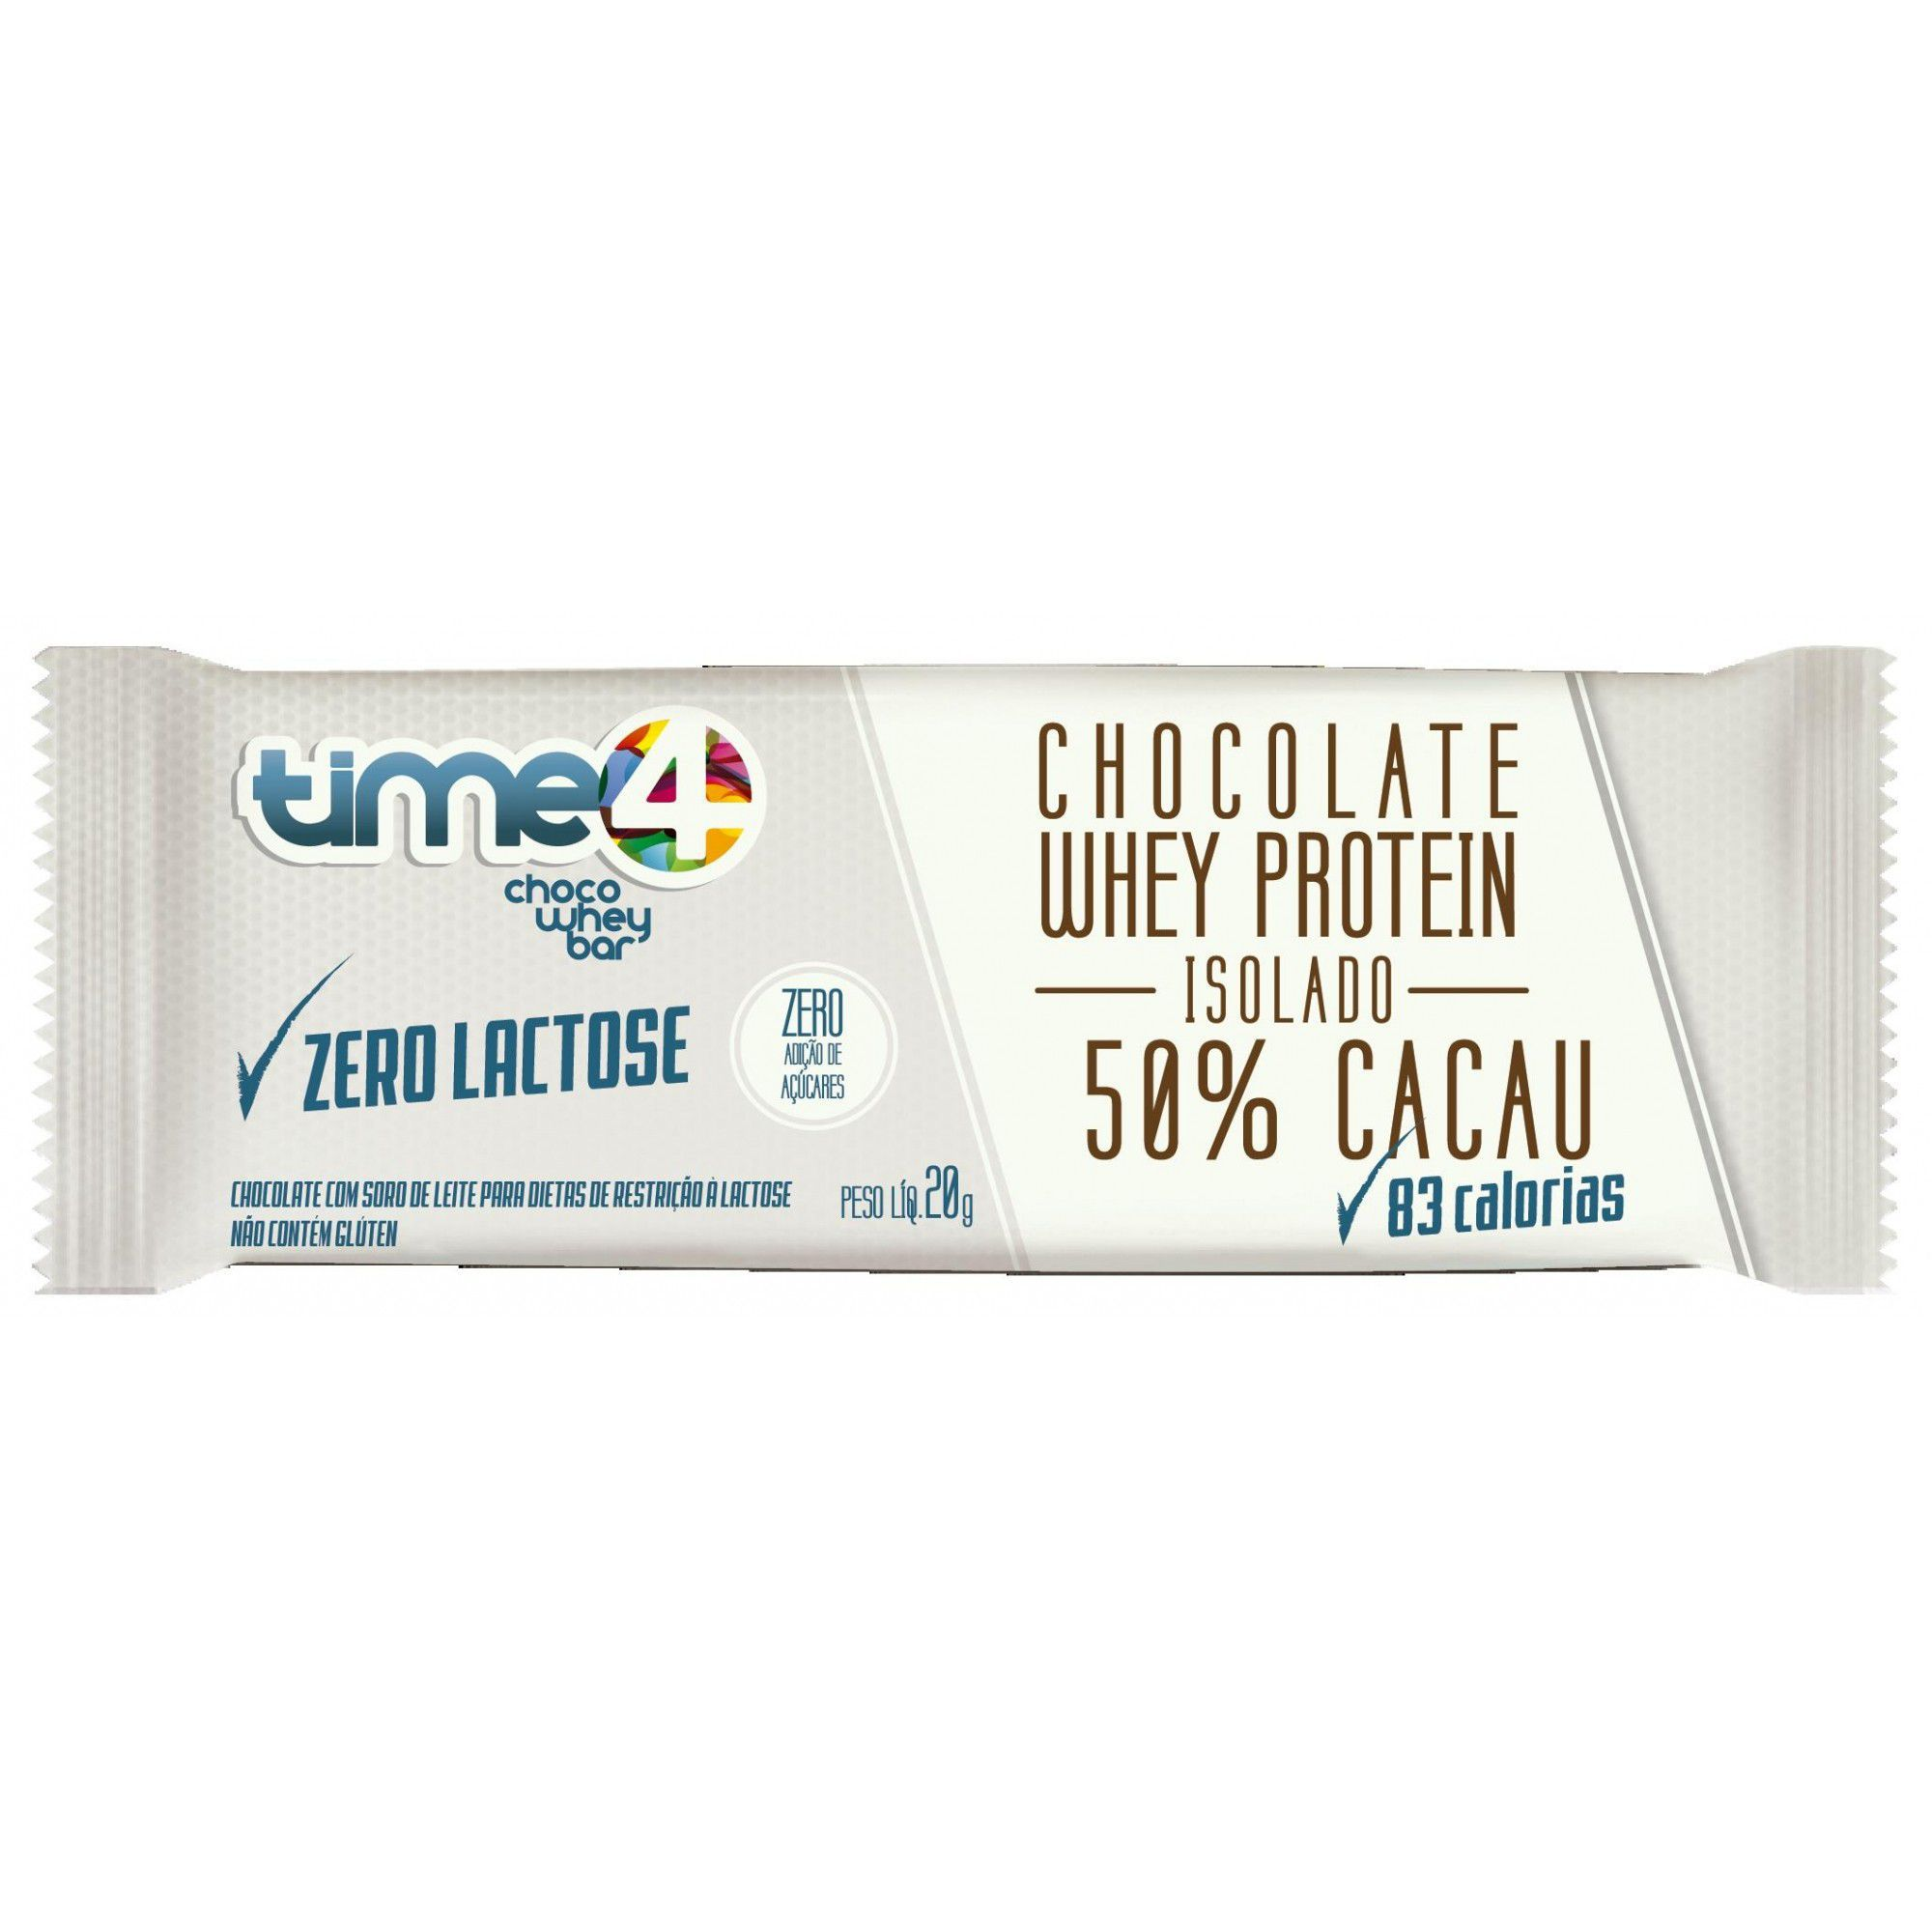 Choco Whey 50% Cacau zero Lactose c/10 un